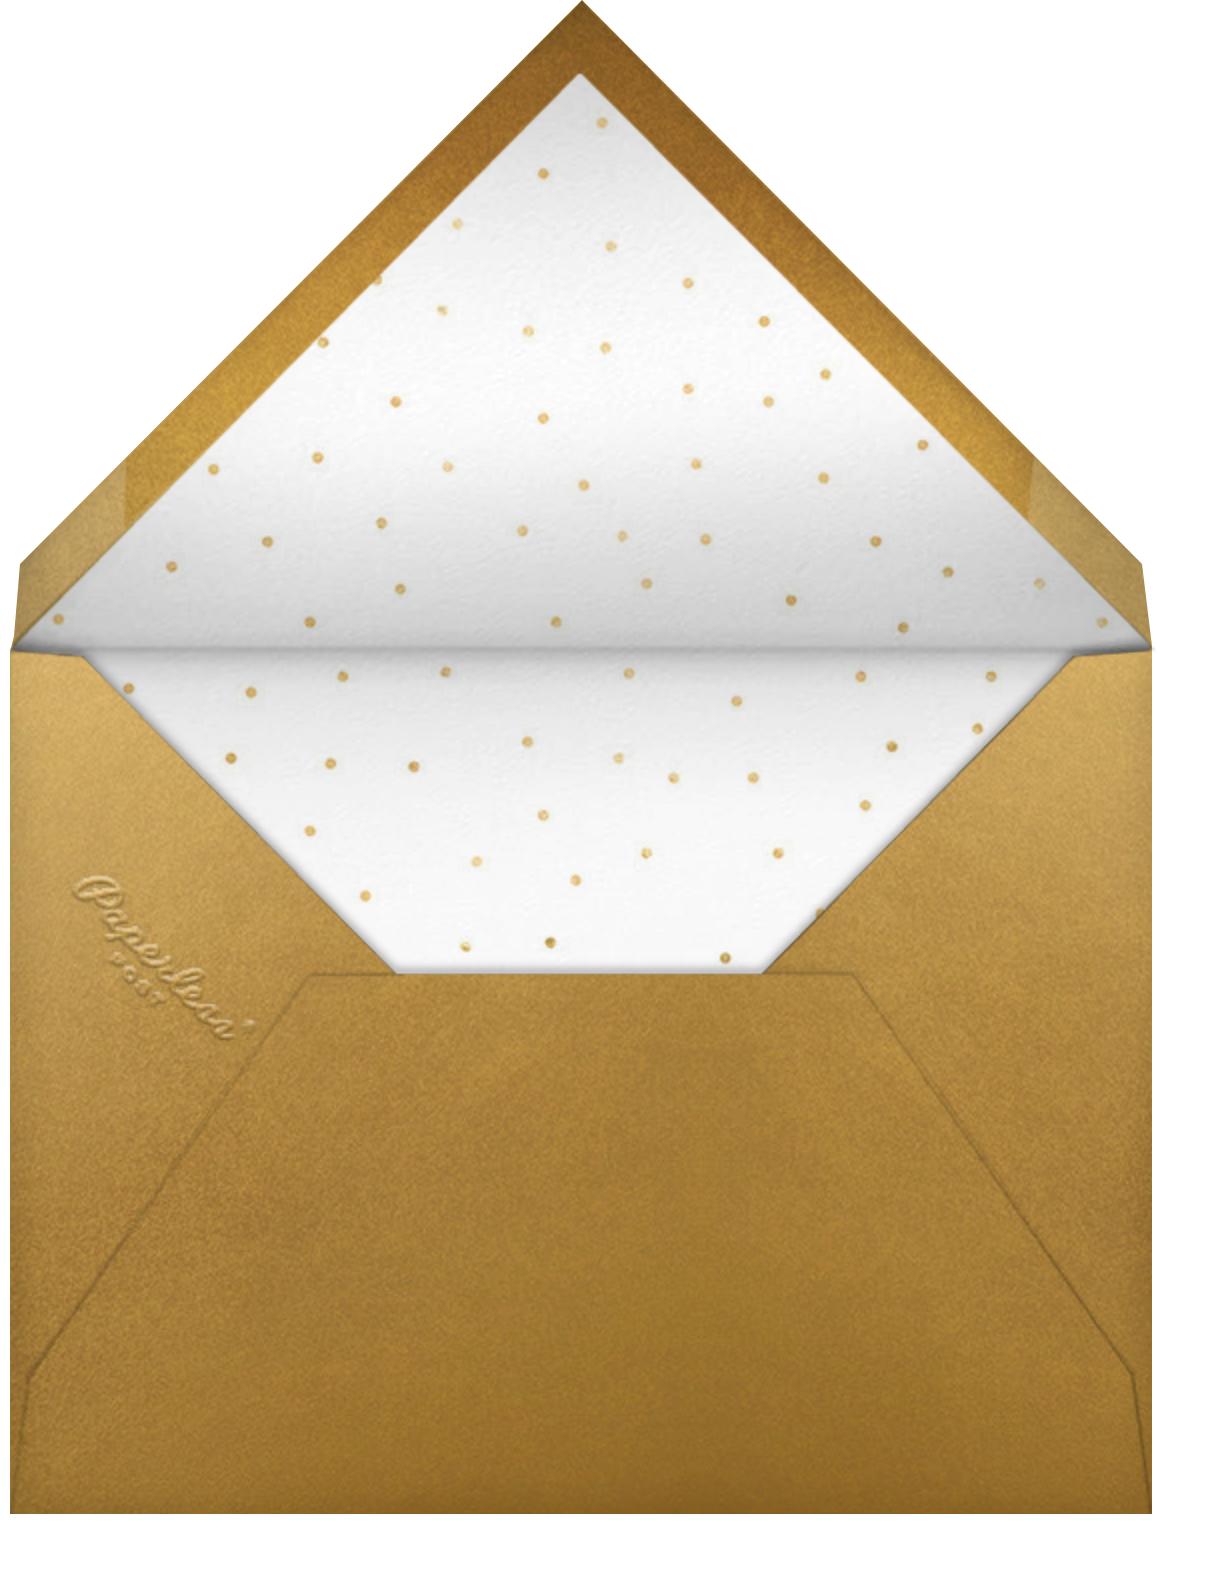 Brushed With Pine - Meri Meri - Christmas party - envelope back